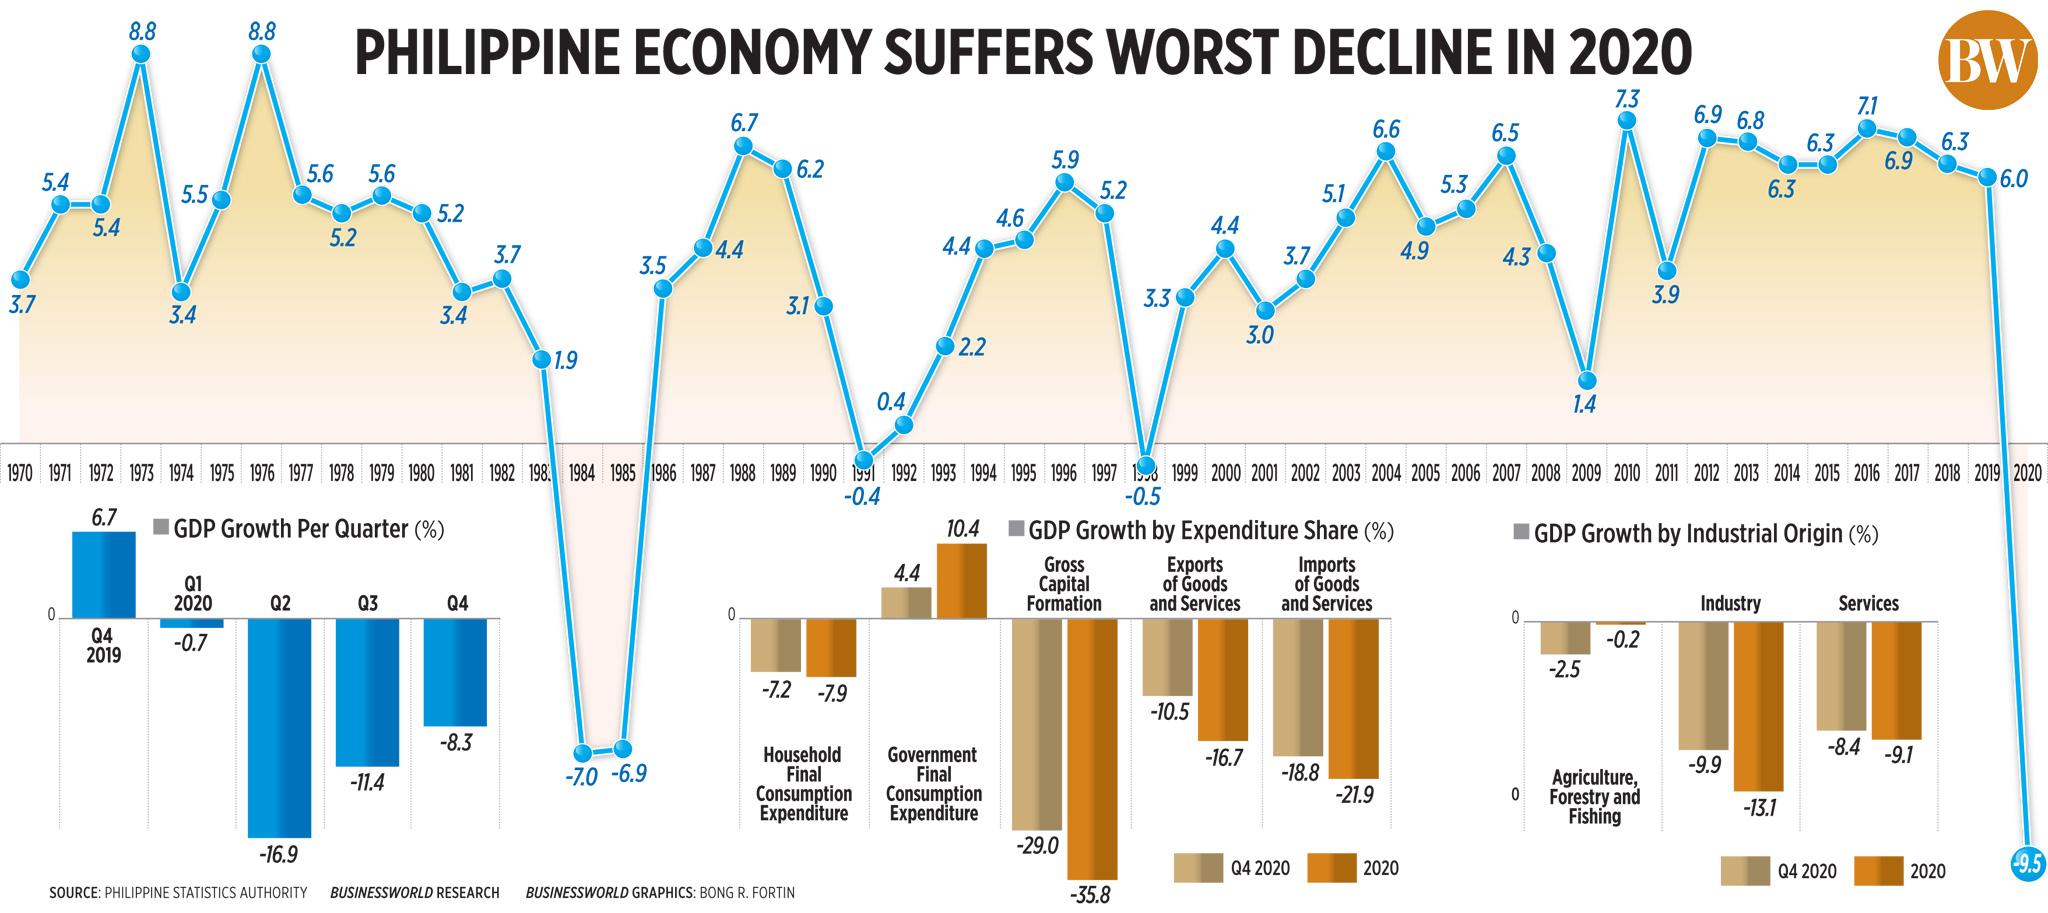 Philippine economy suffers worst decline in 2020